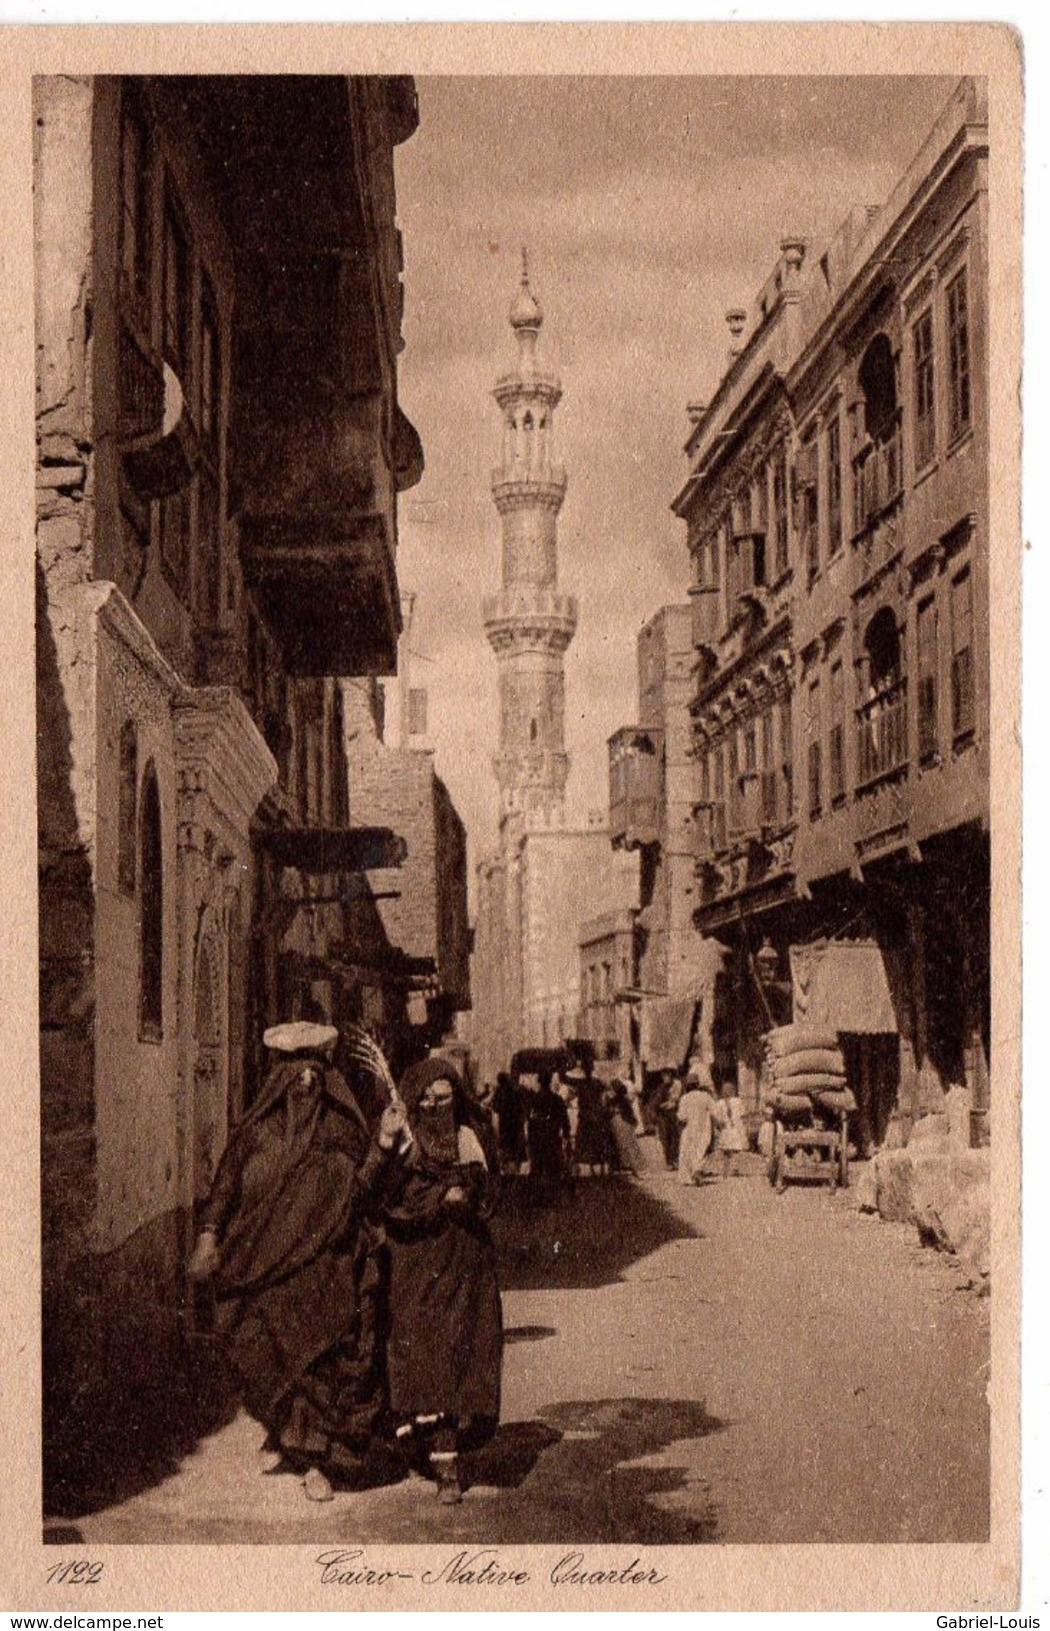 Cairo - Native Quarter - El Cairo